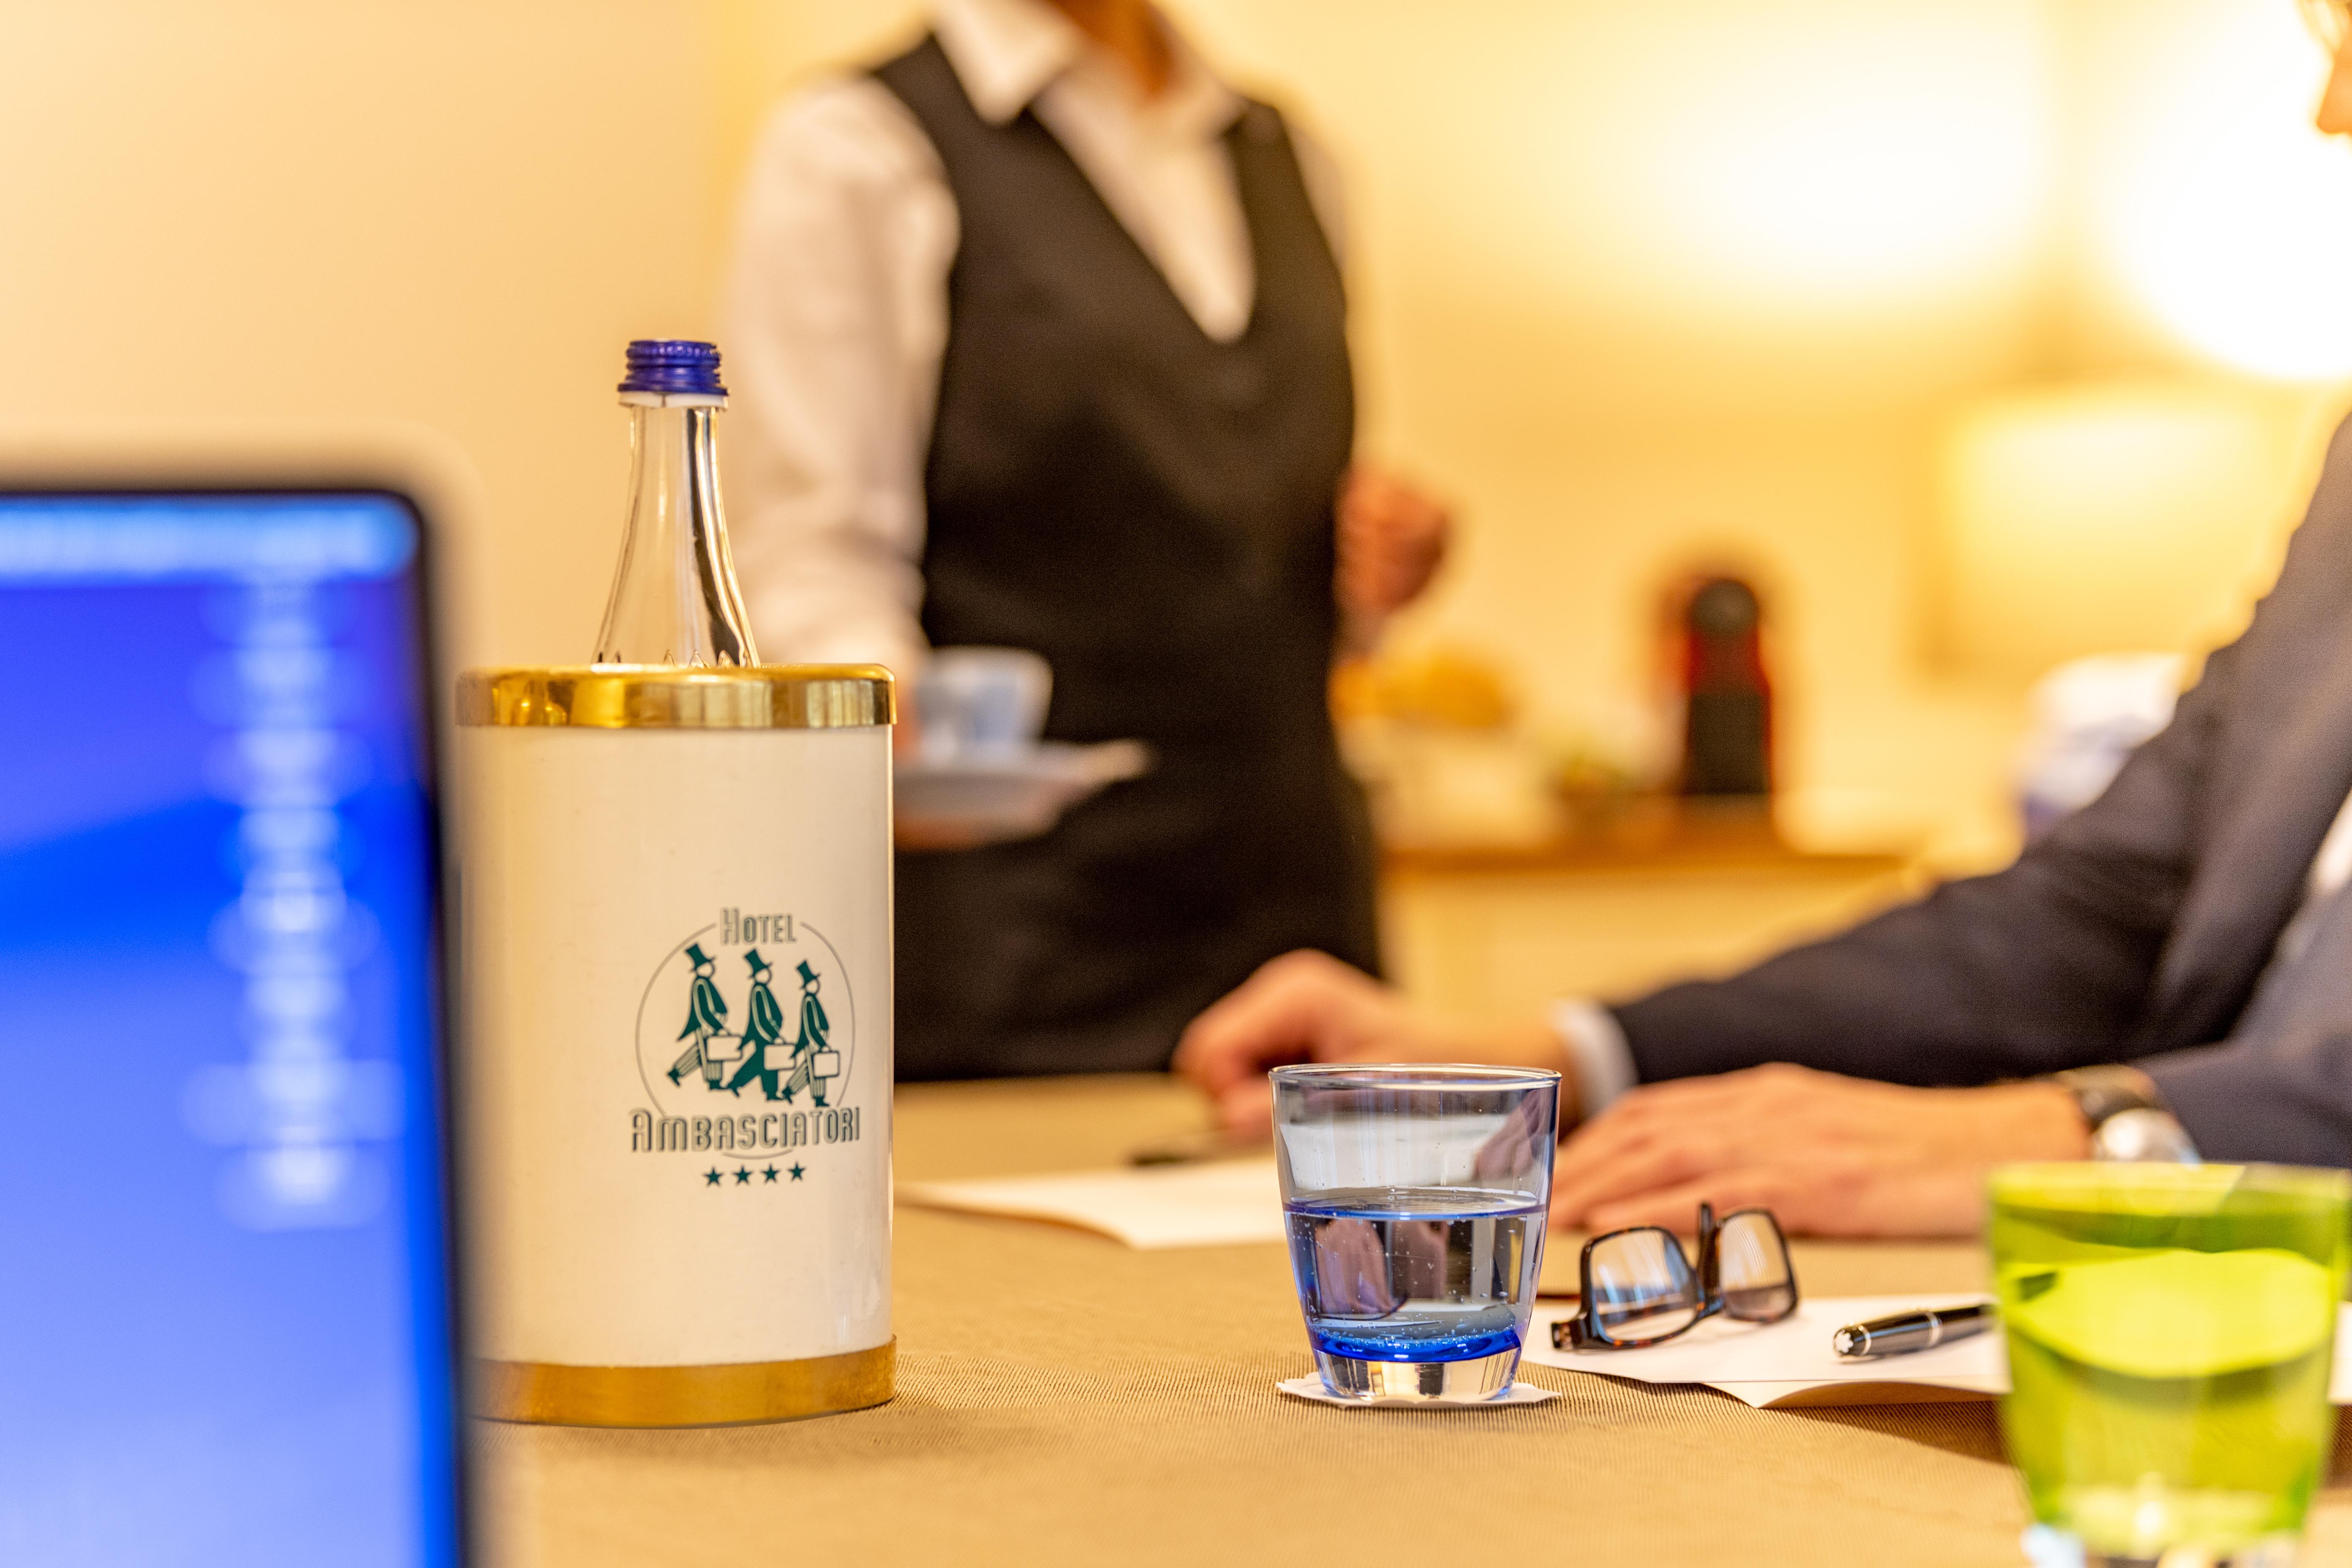 hotel ambasciatori brescia santa santa giulia